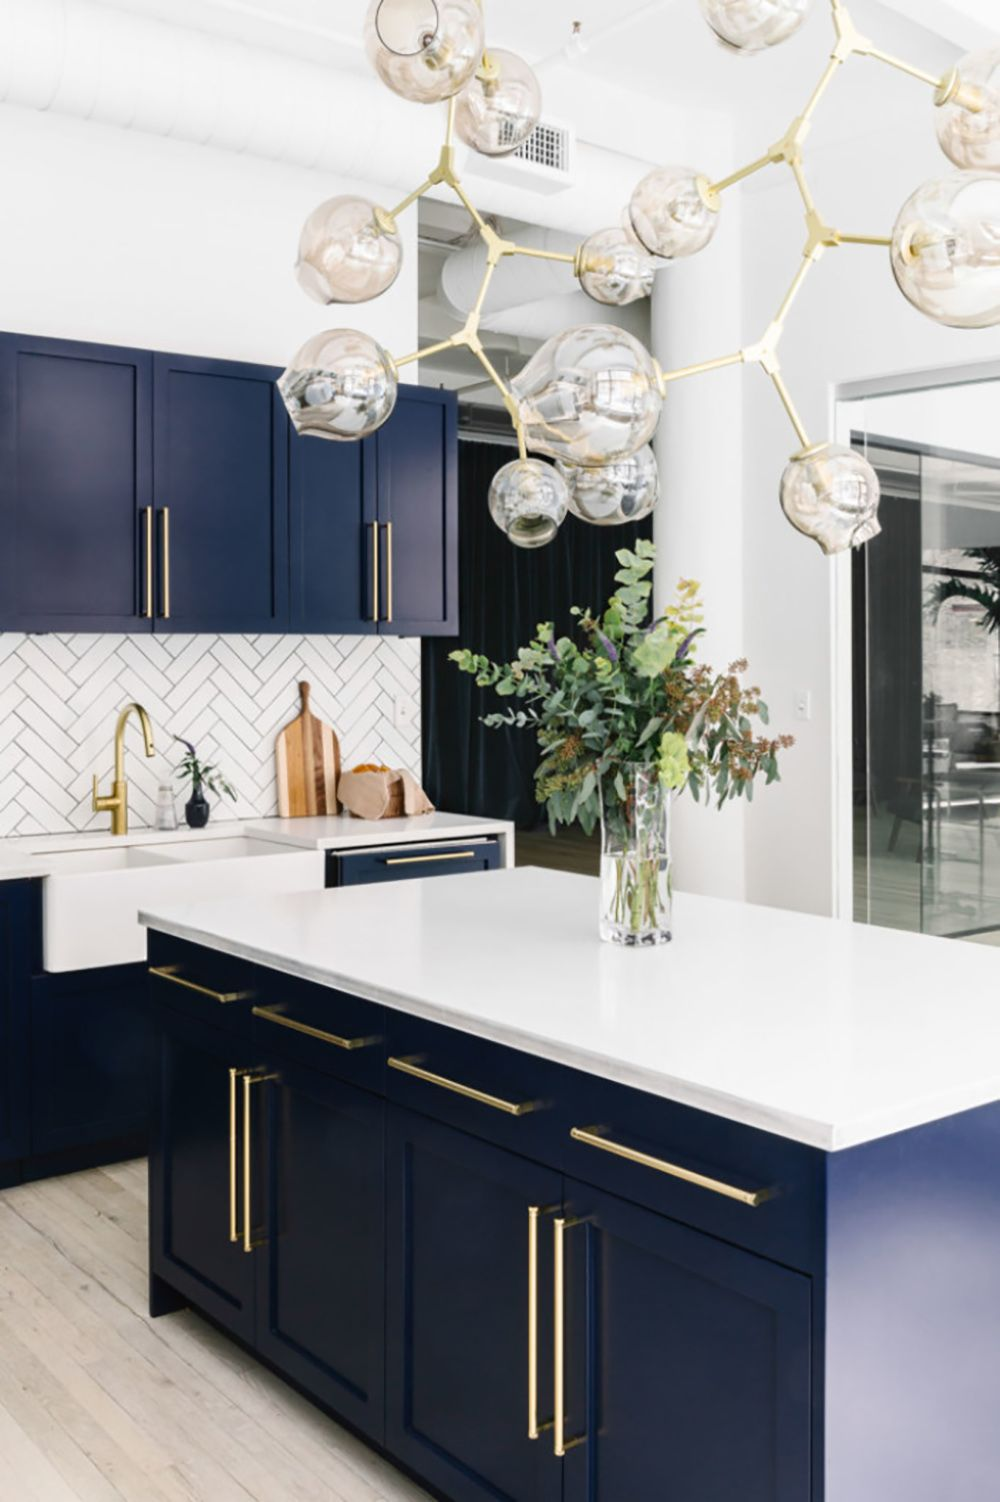 My new obsession: kitchen brass details | Arredo interni ...